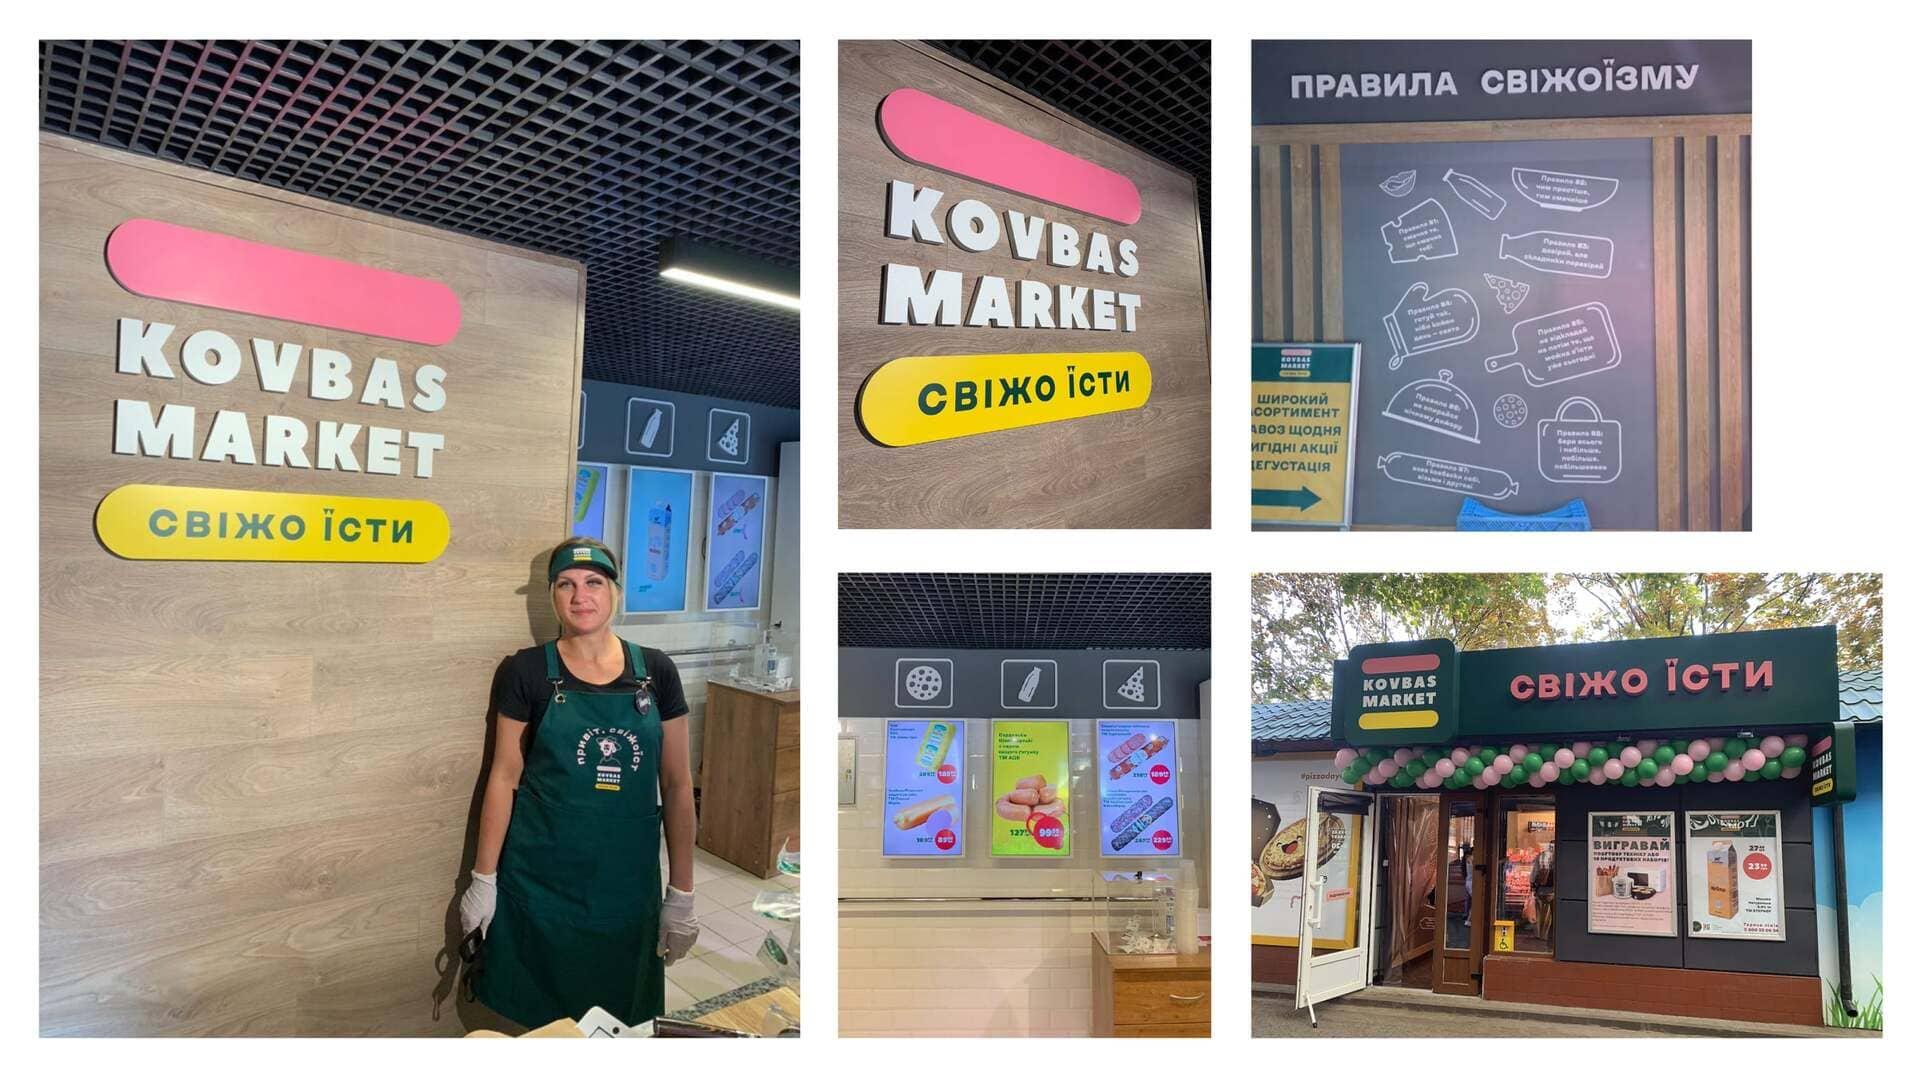 gra brand design kovbas market 9